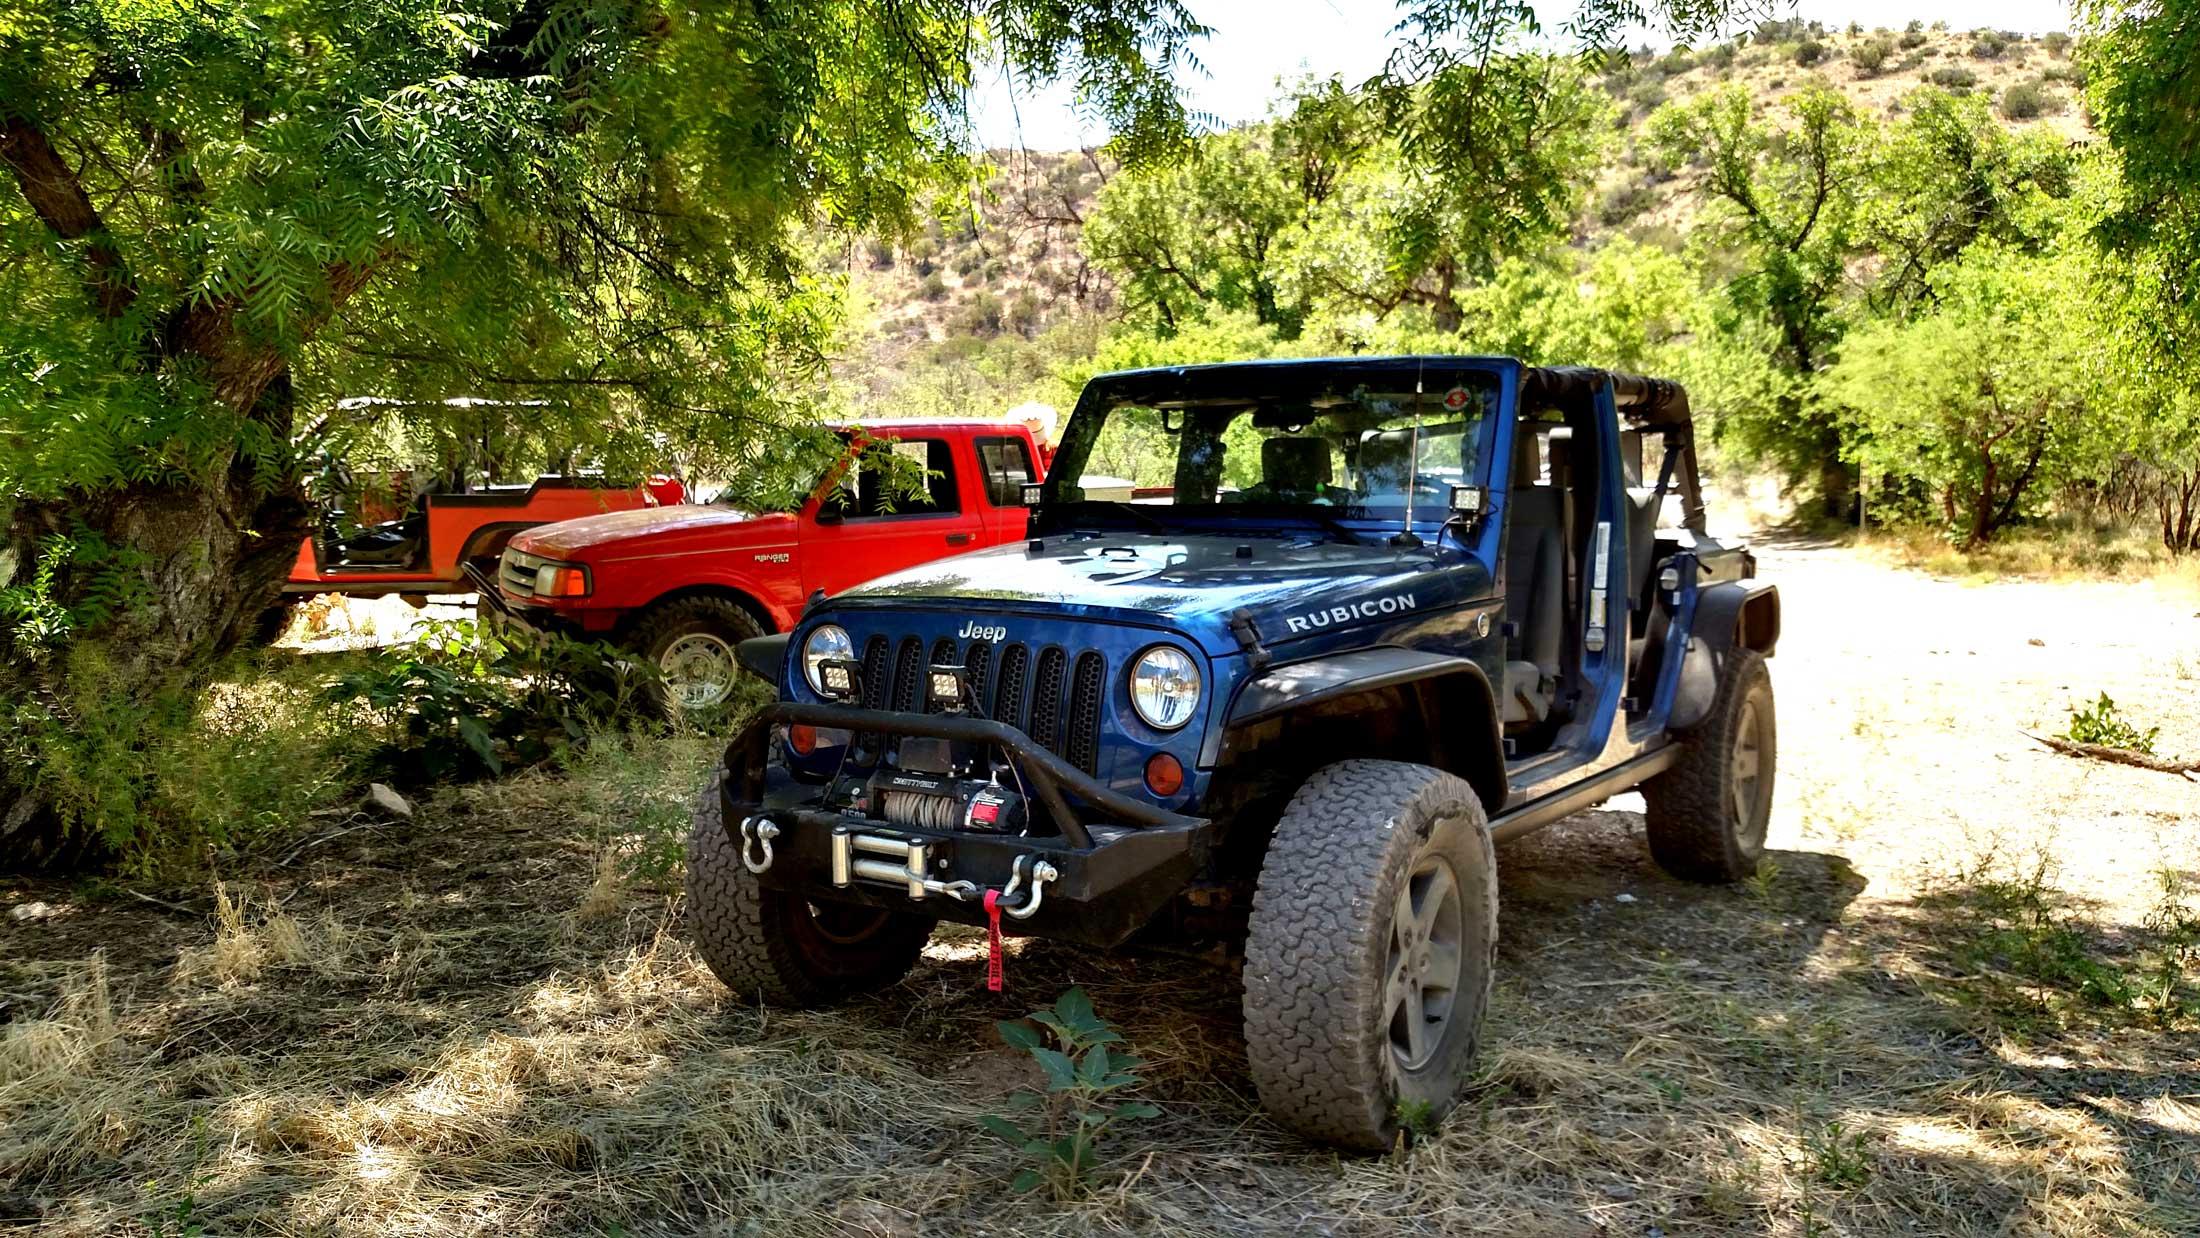 Trail Break & Photo Opp